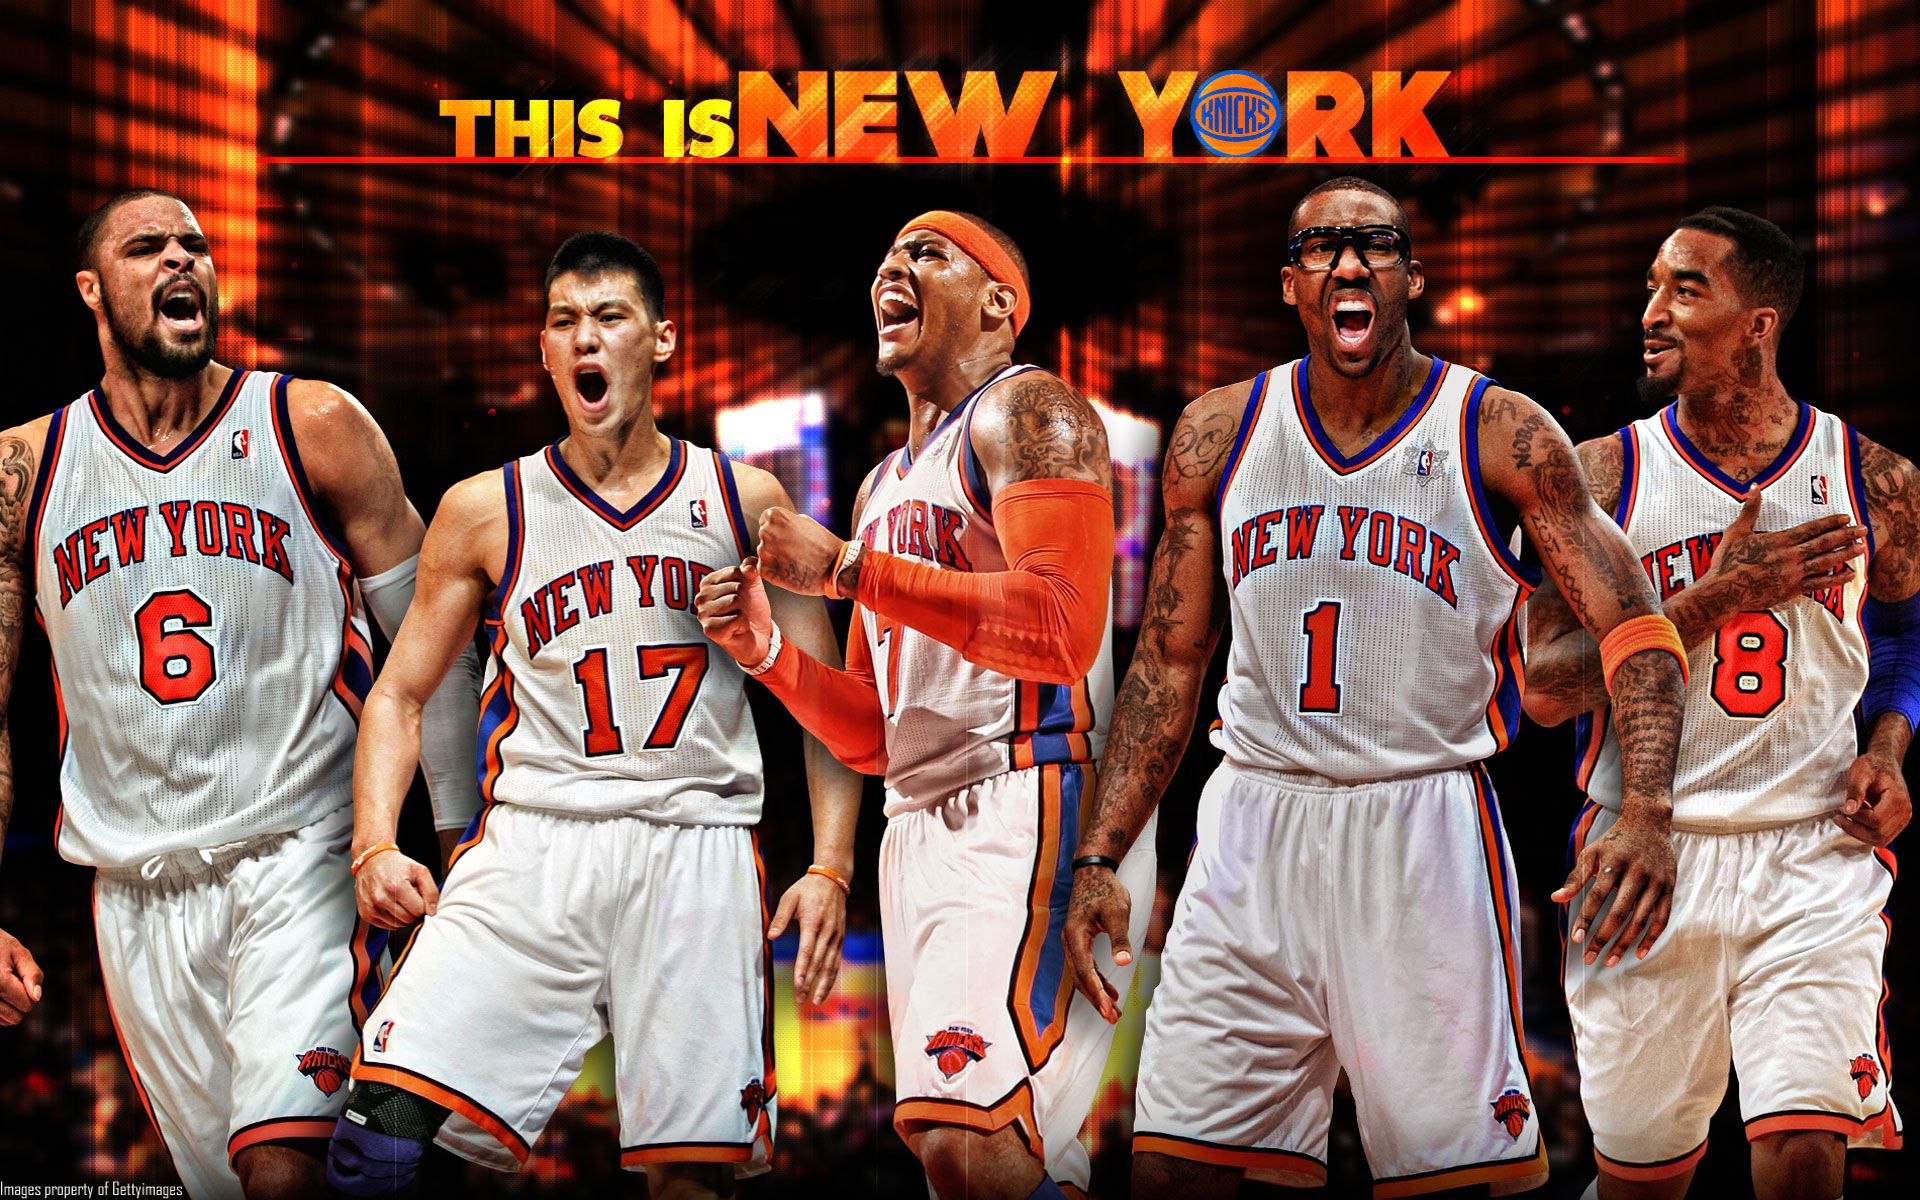 This Is New York Knicks Nba New York New York Knicks Logo New York Knicks